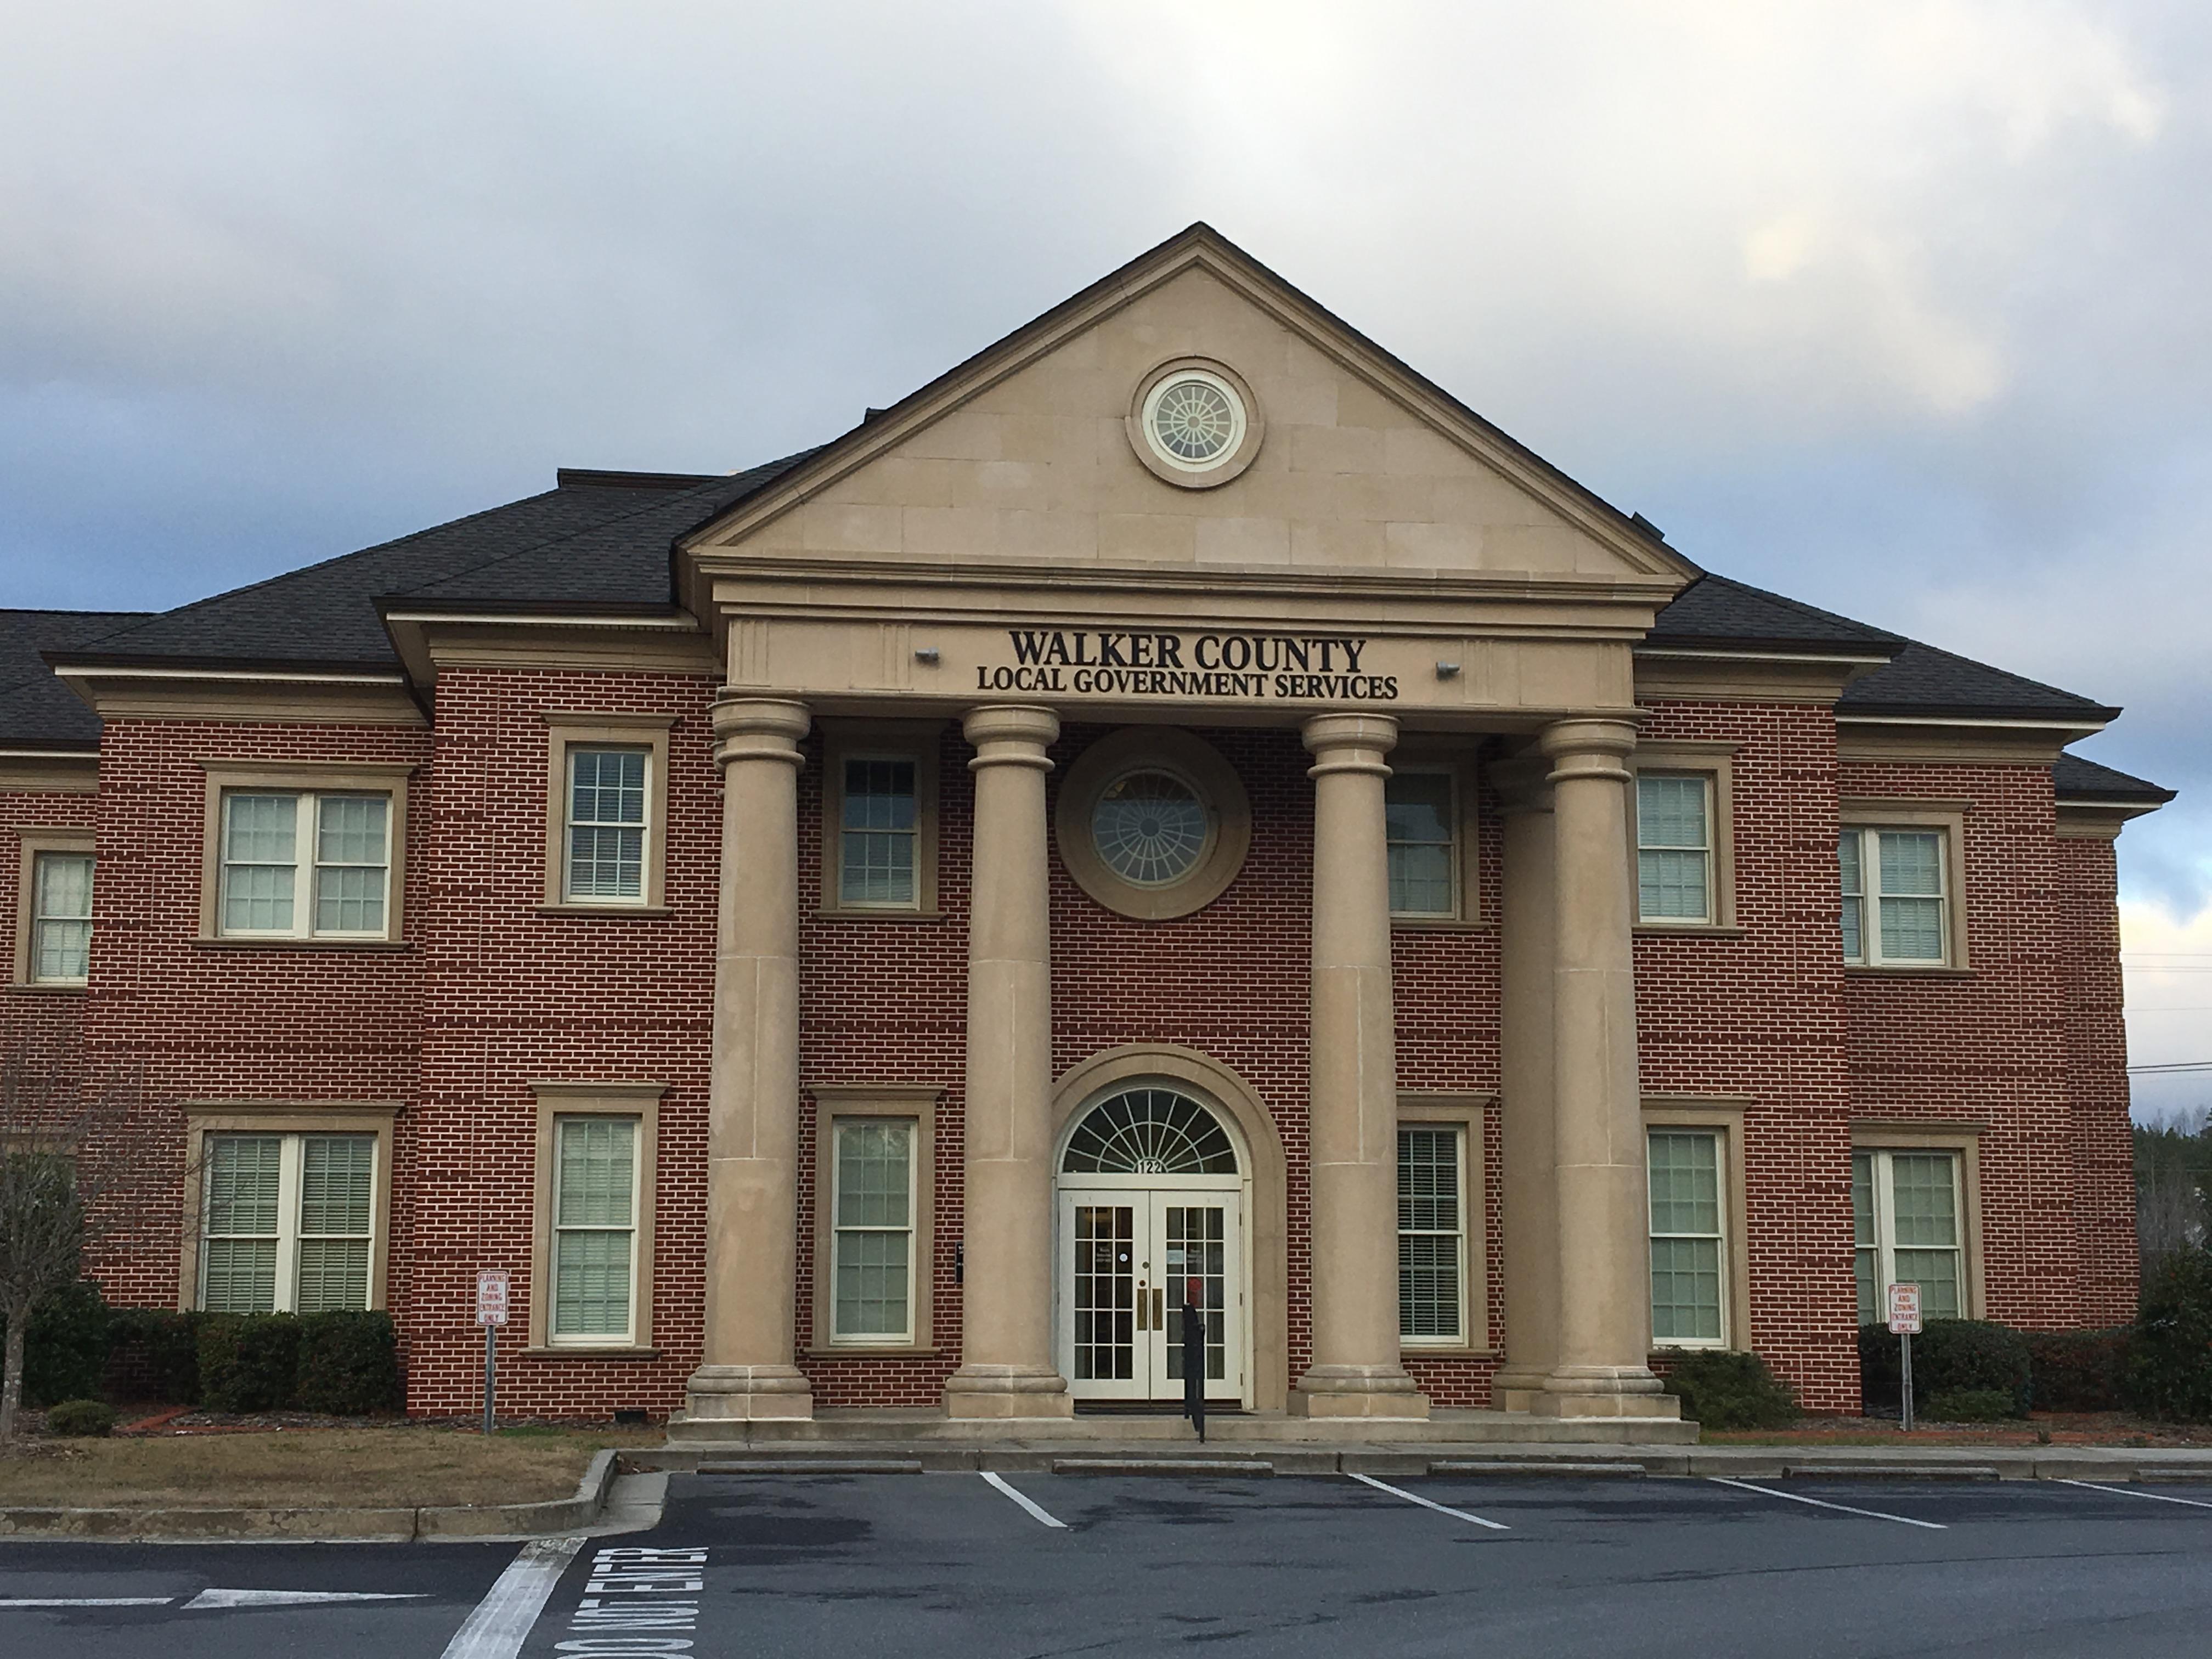 Walker county property tax assessor